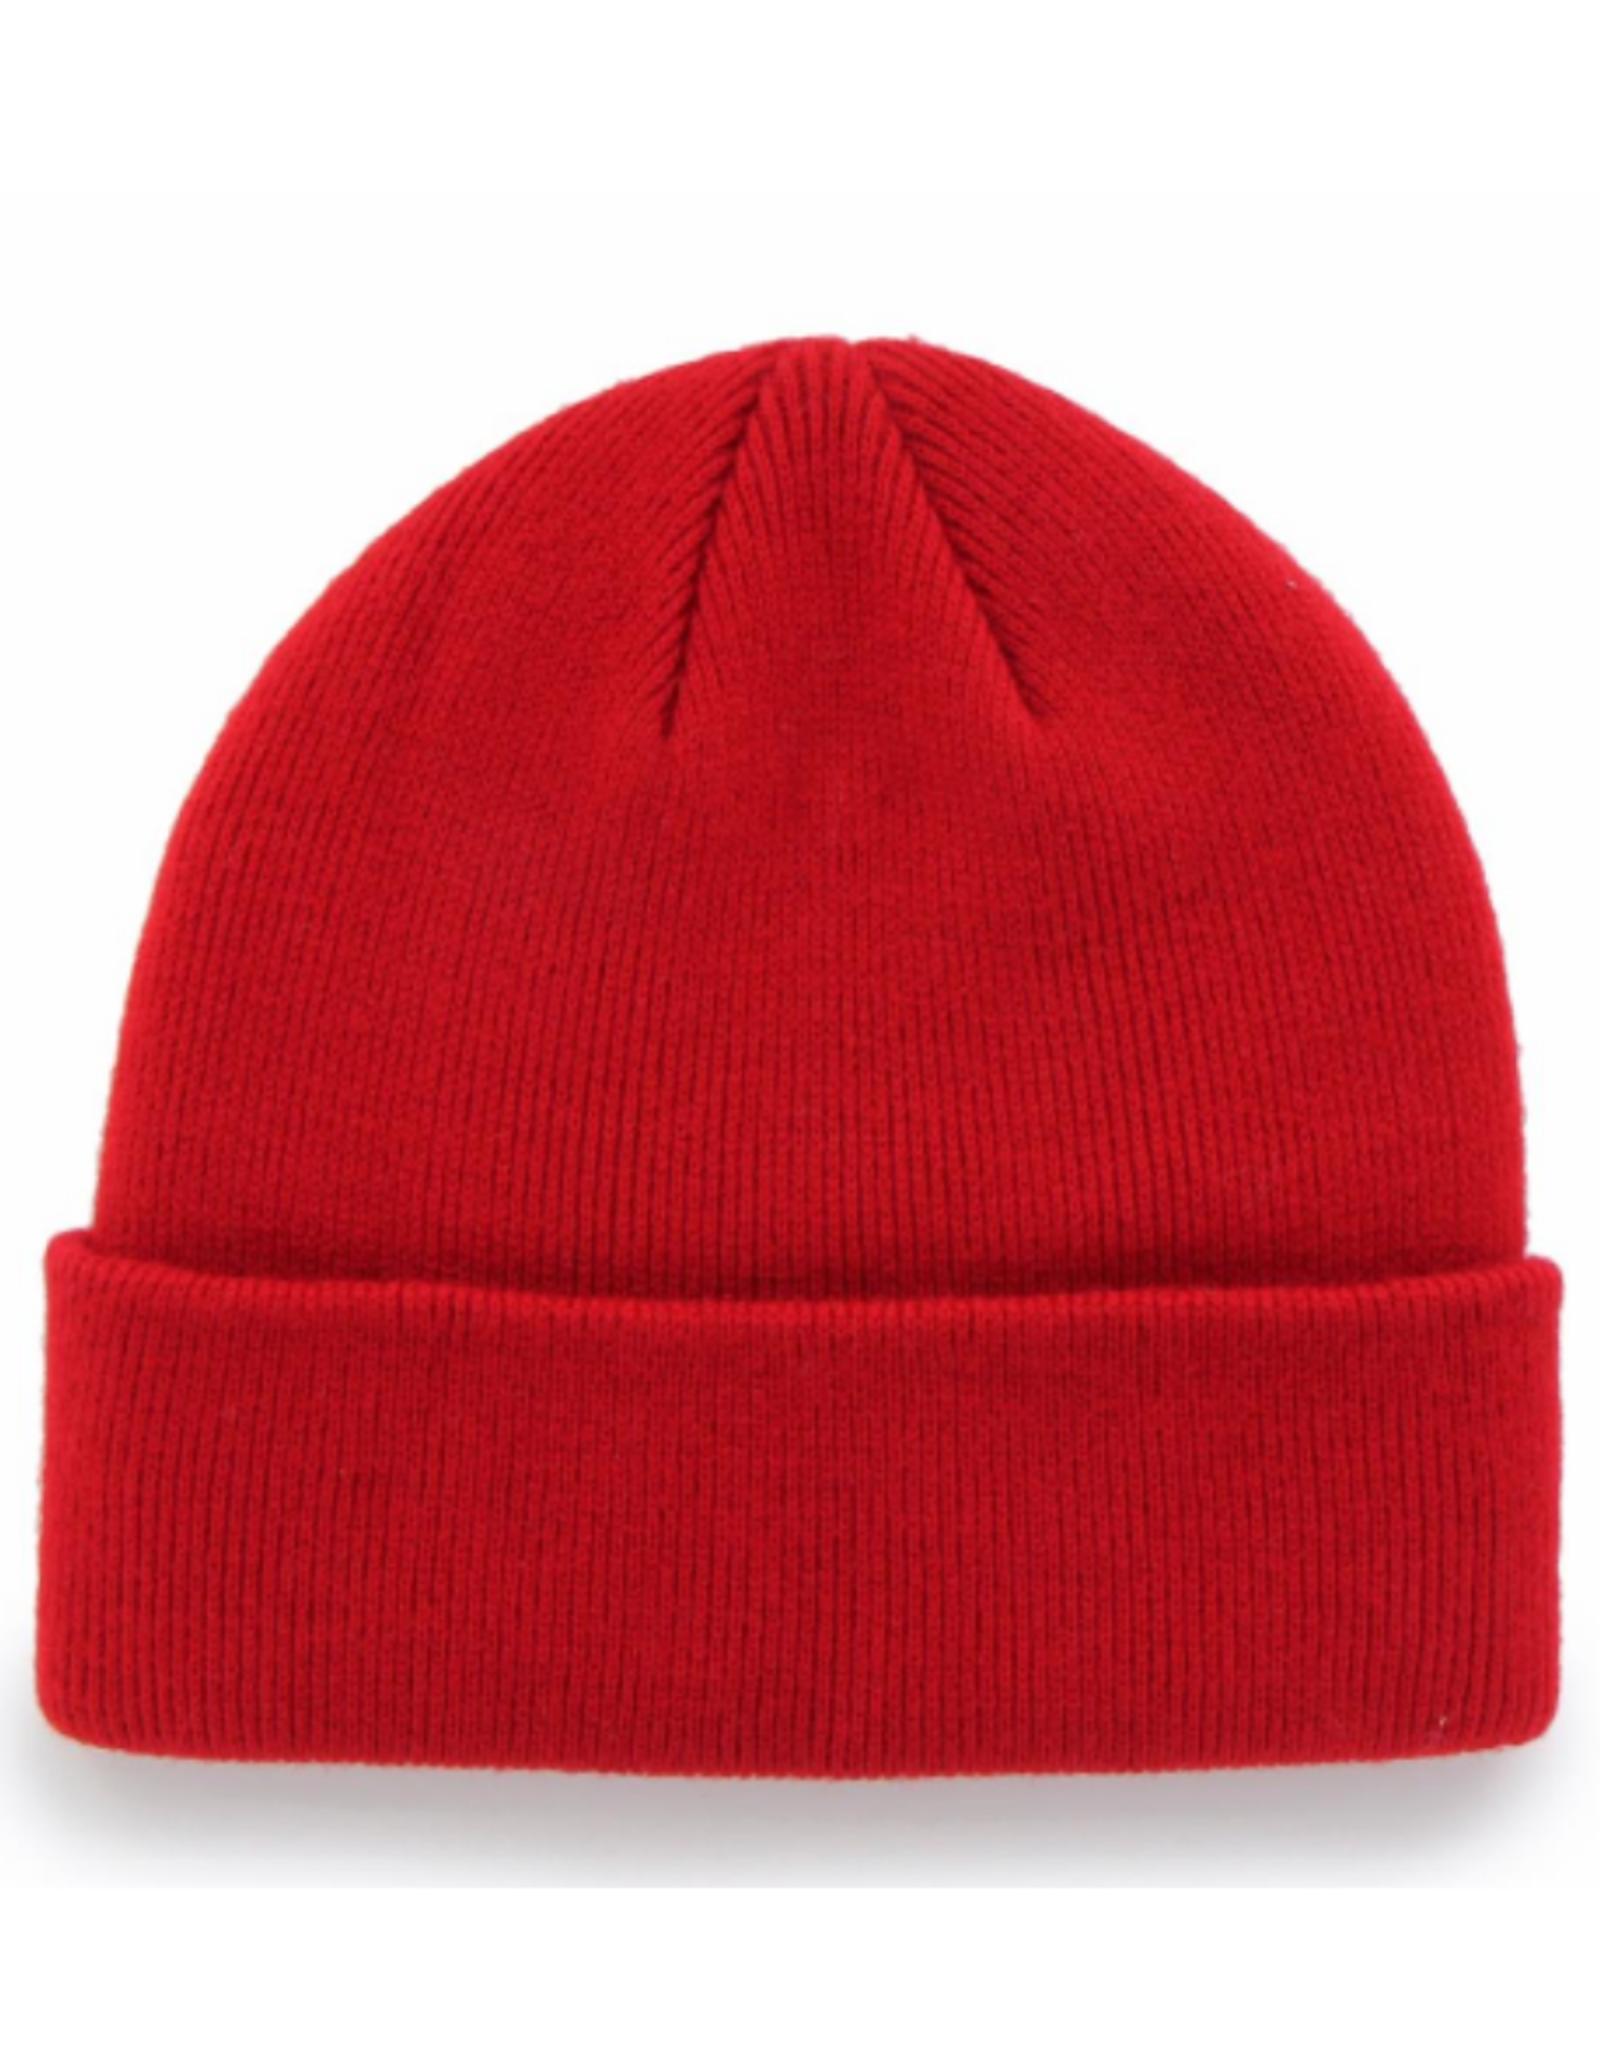 '47 Adult Raised Cuff Knit Washington Capitals Red